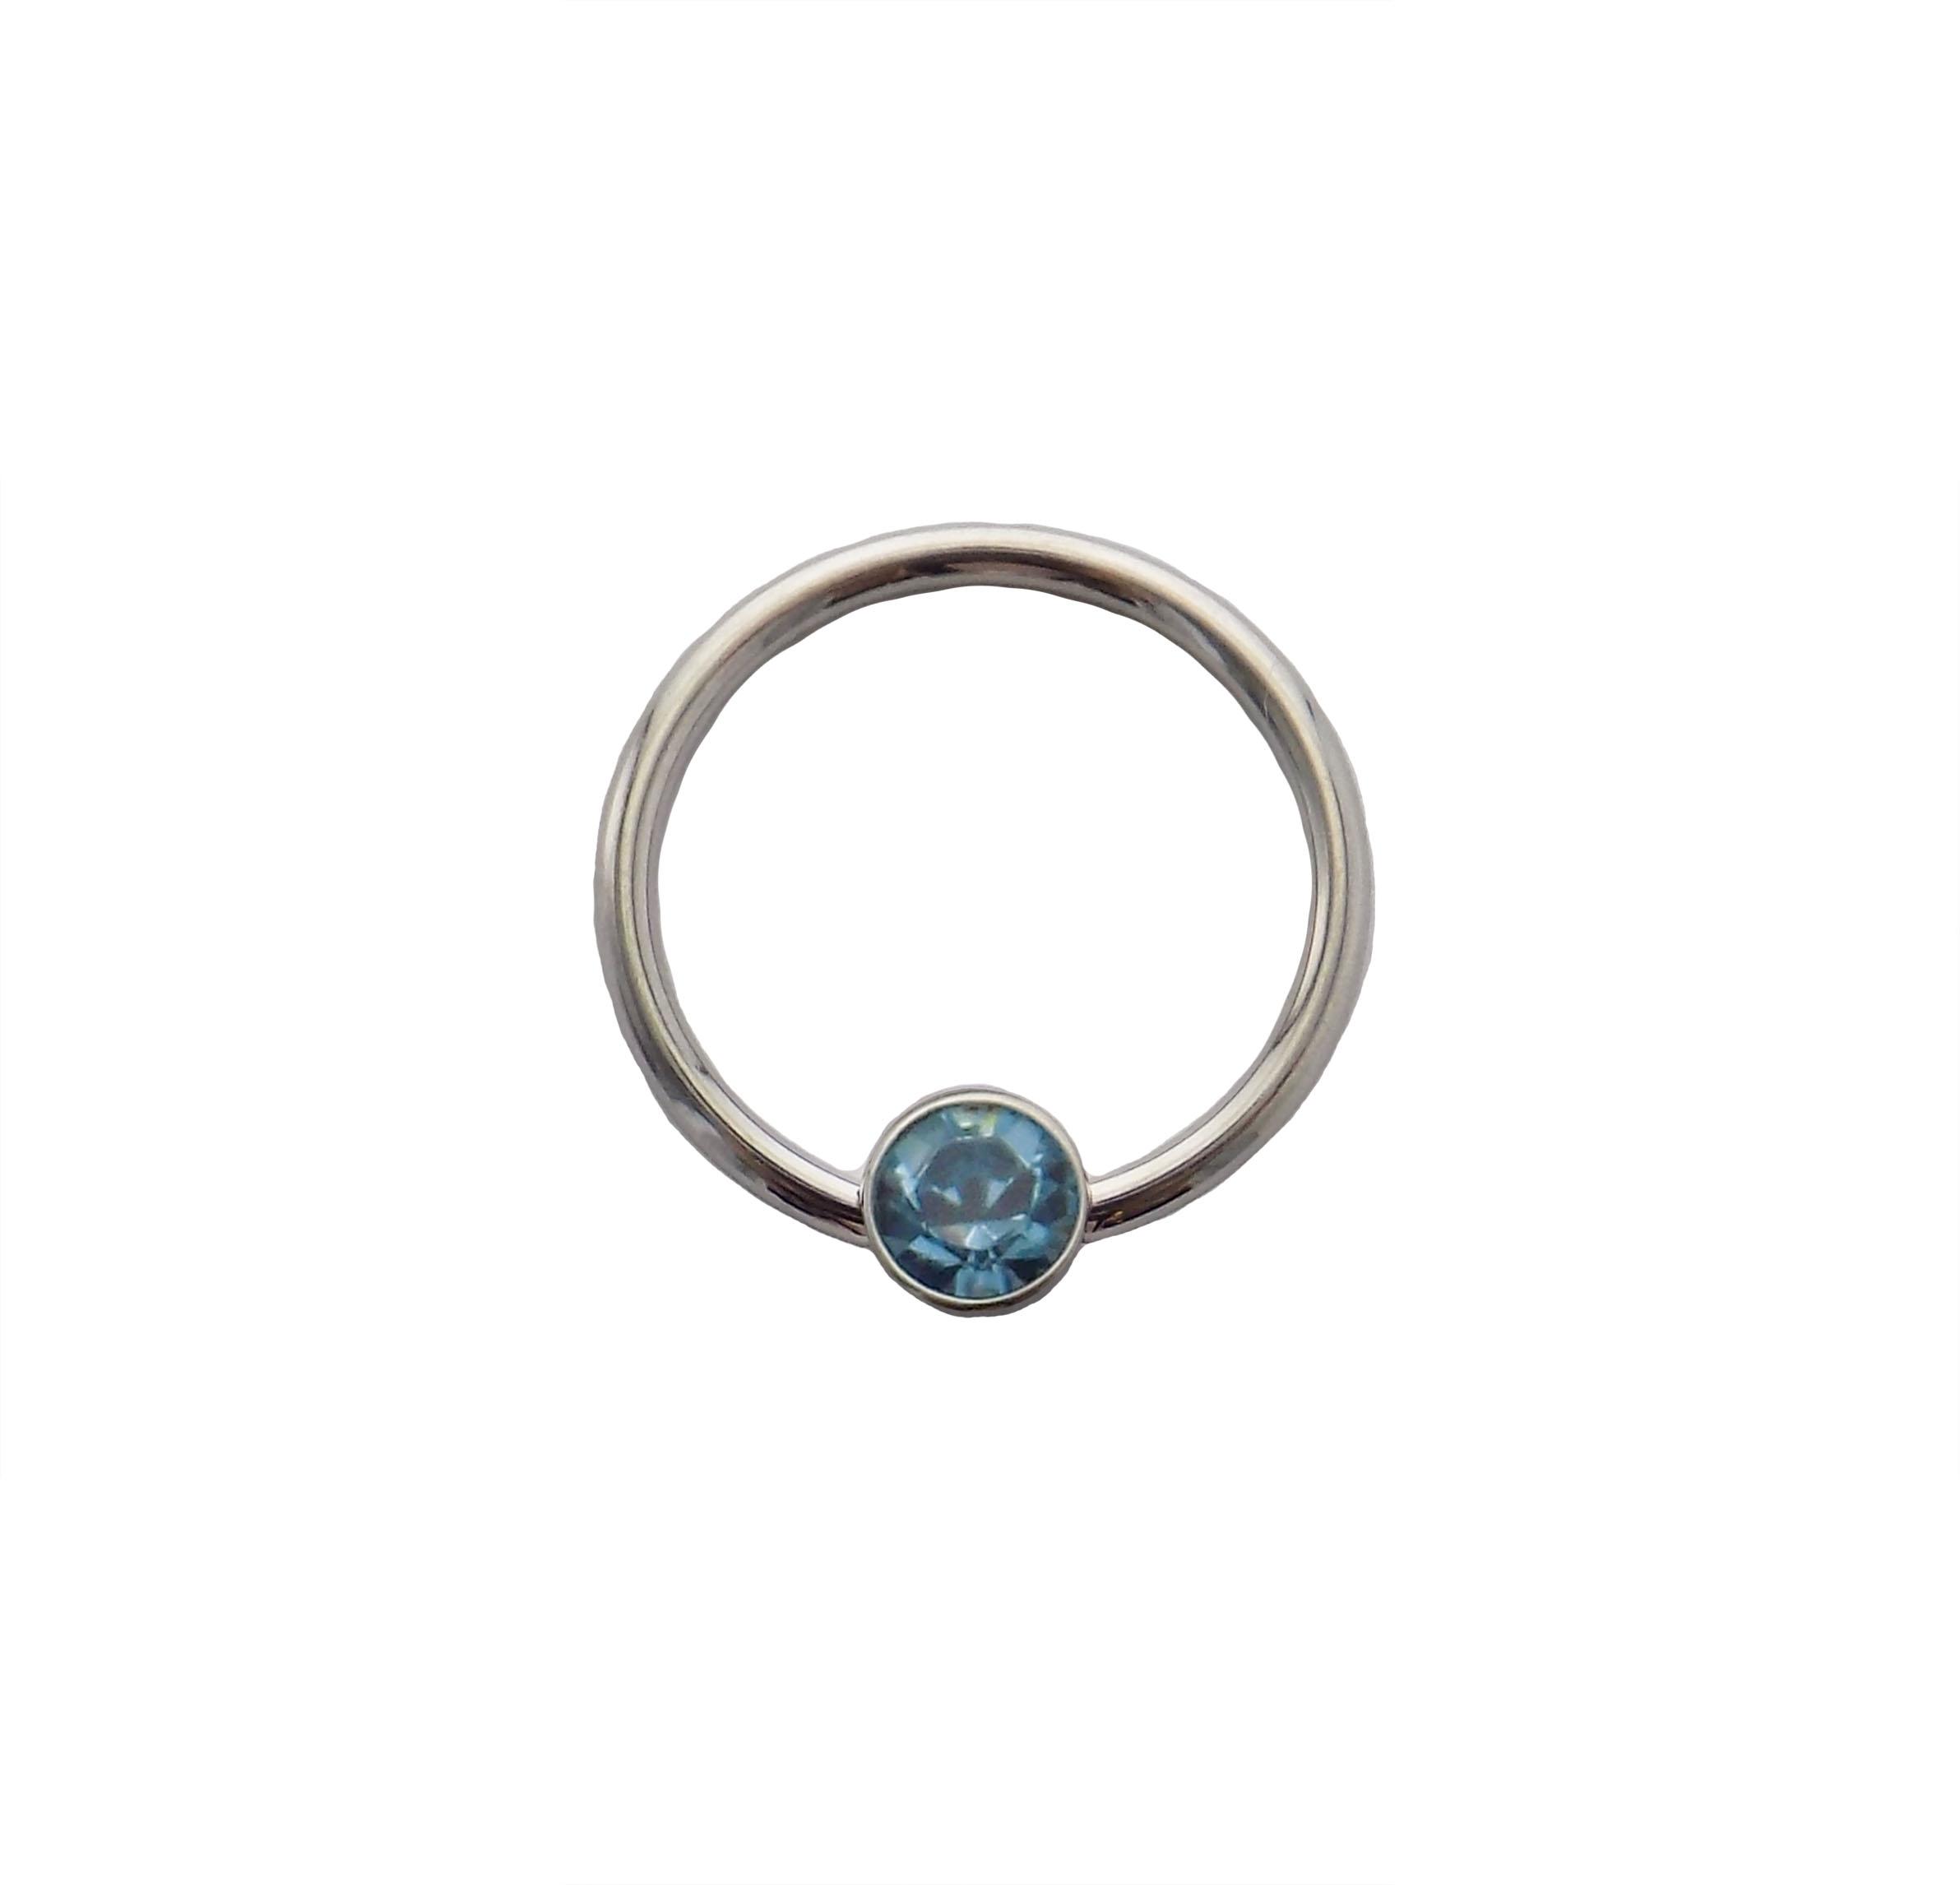 Captive Bead Ring Jewelry